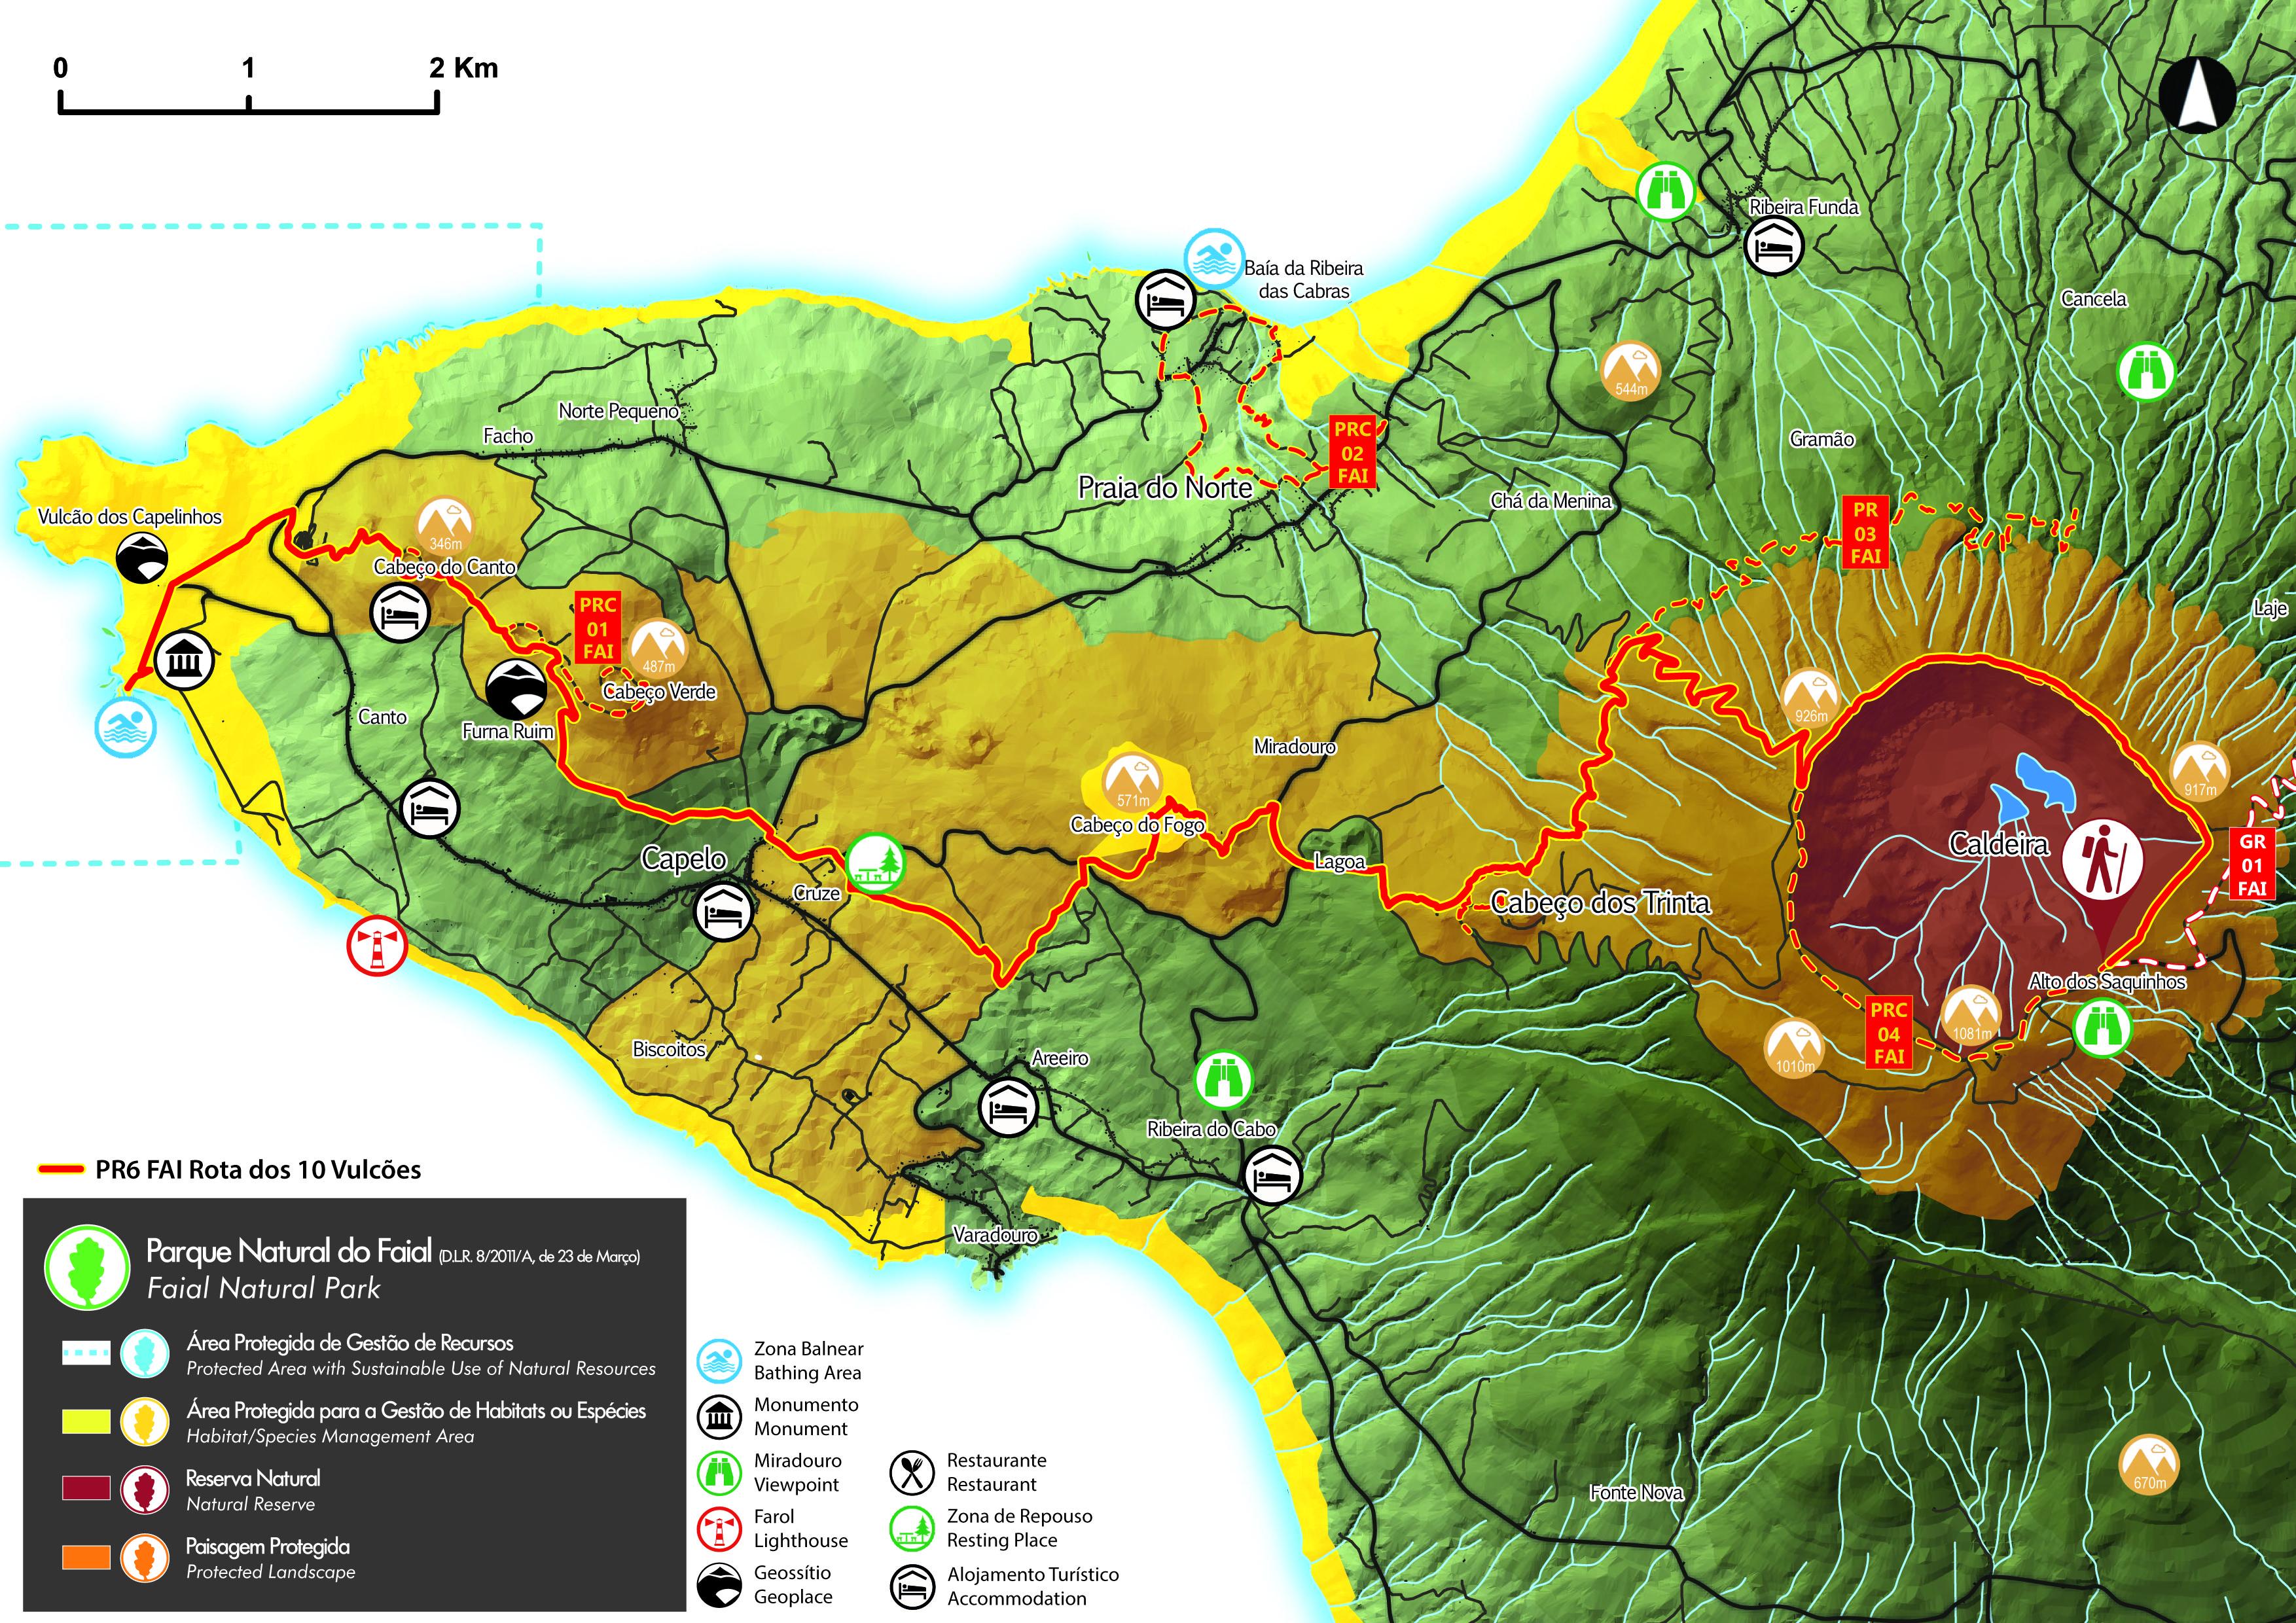 Pr6fai Dez Vulcoes Maps And Gps Tracks Hiking Routes